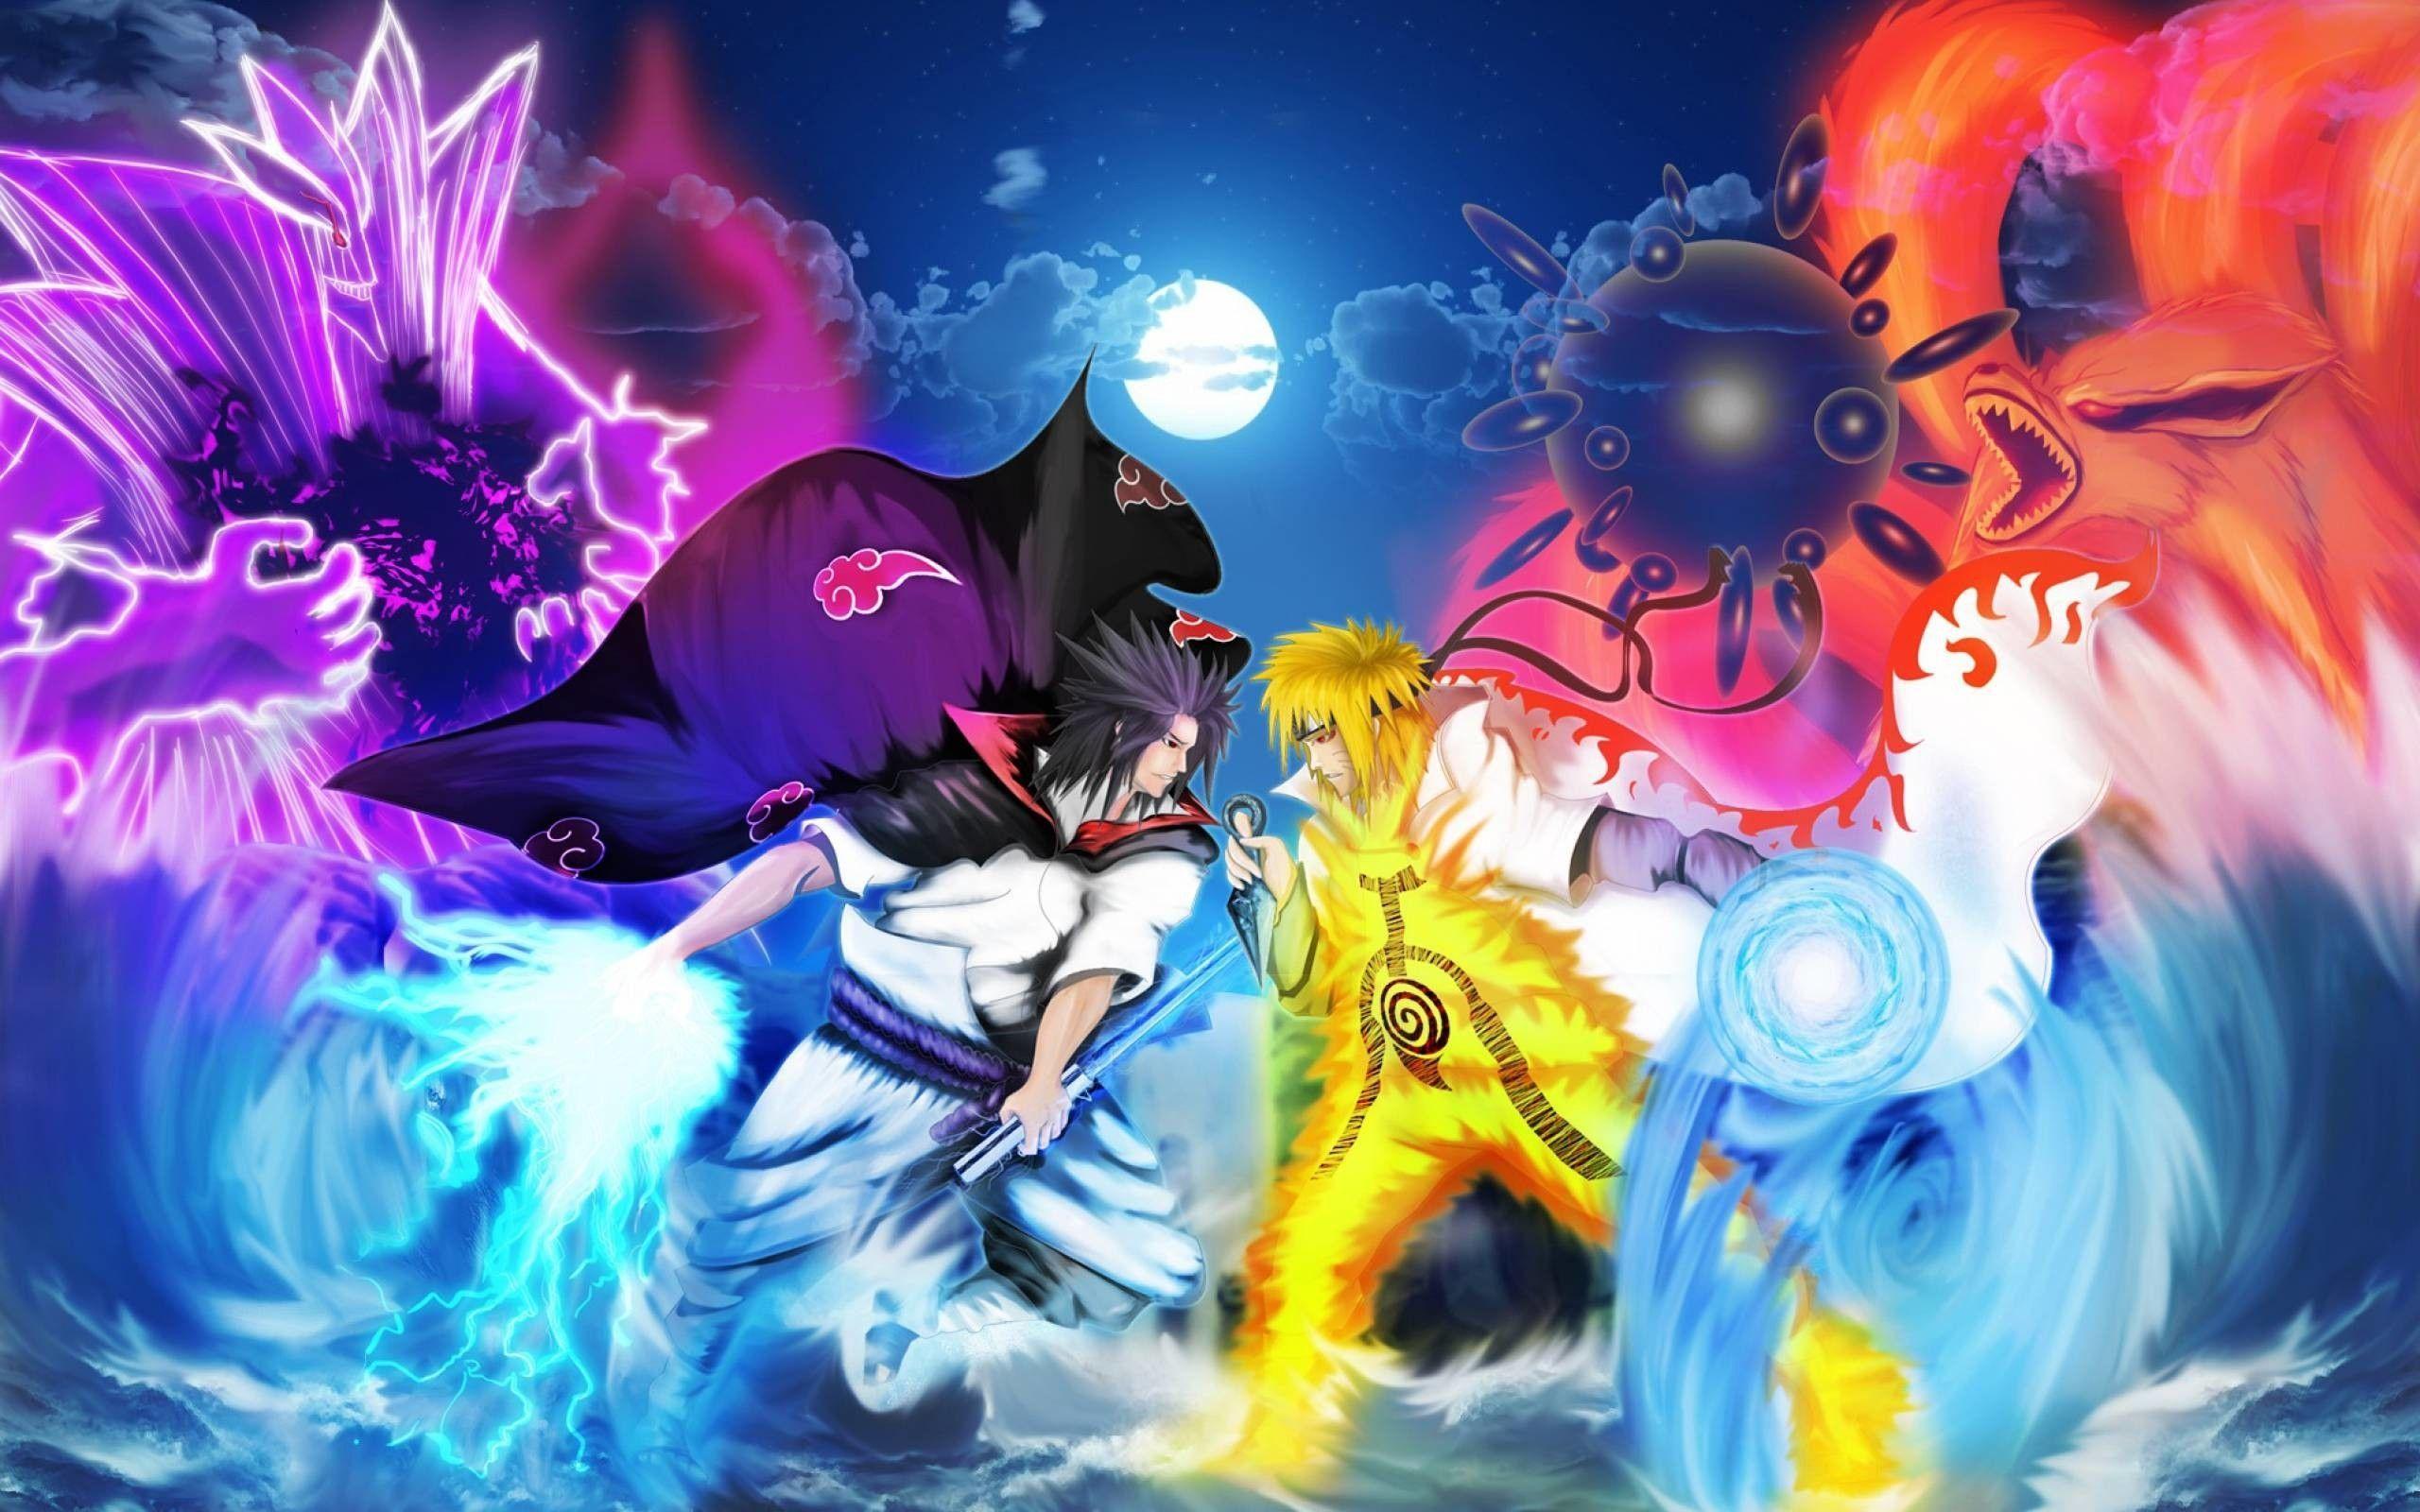 1024x1024 · miku anime live wallpaper. Anime Live Wallpapers - Top Free Anime Live Backgrounds ...